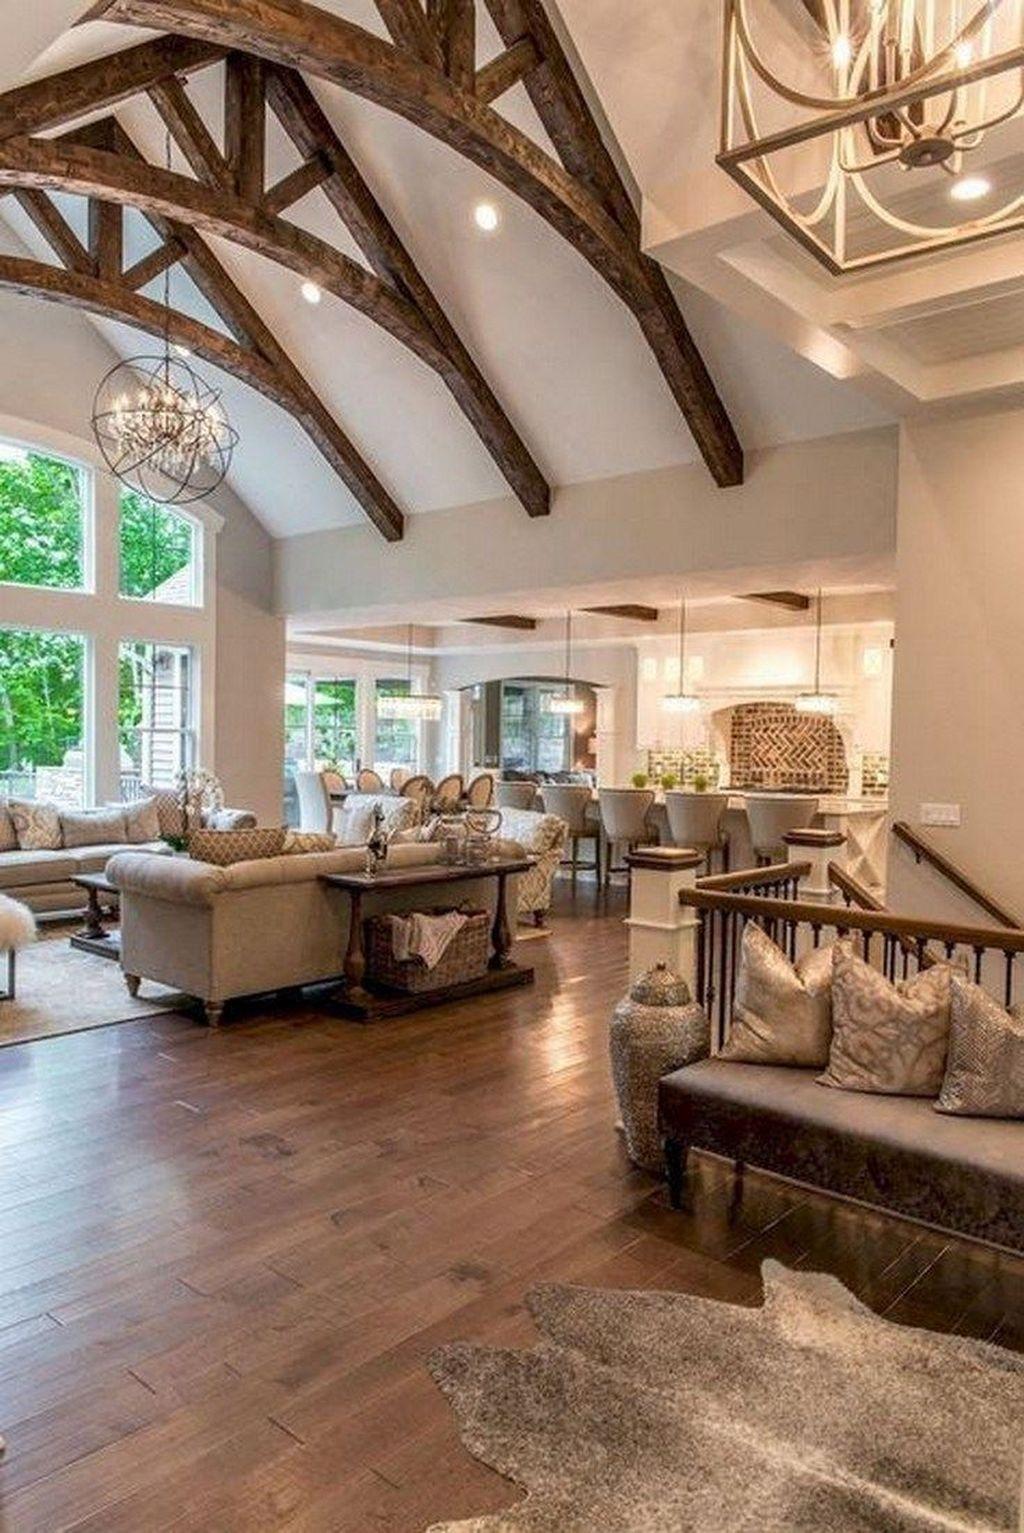 Photo of 42 Popular Interior Design Ideas With Farmhouse Style